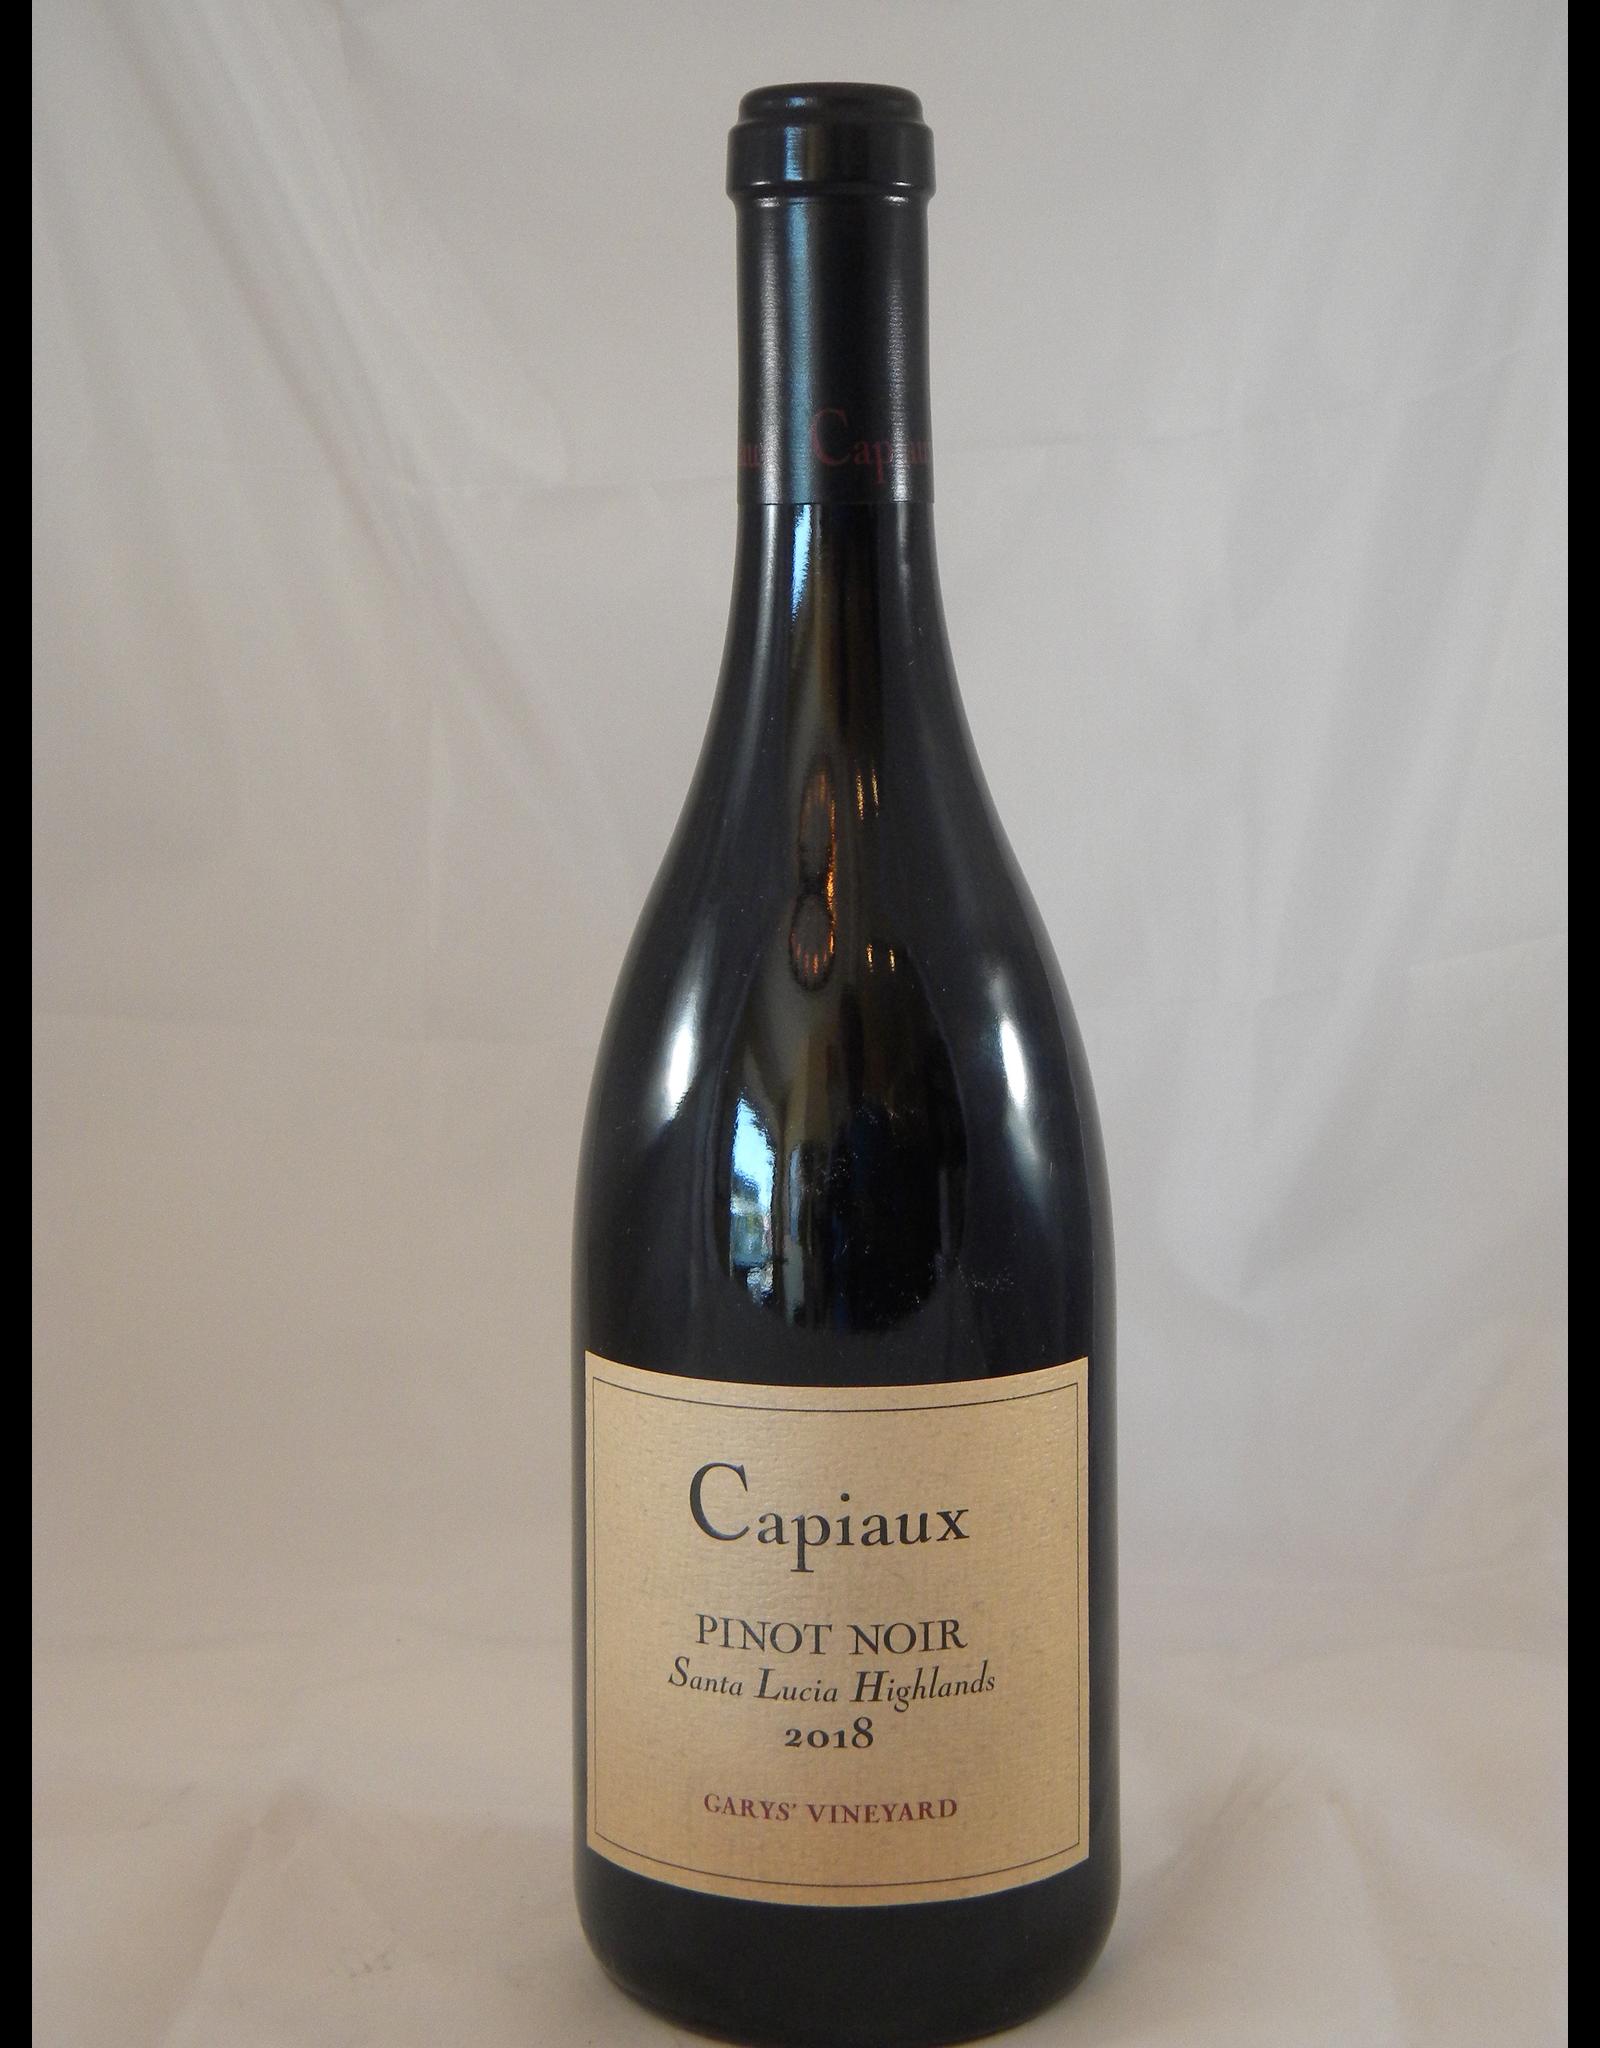 Capiaux Capiaux Pinot Noir Santa Lucia Highlands Gary's Vineyard 2018